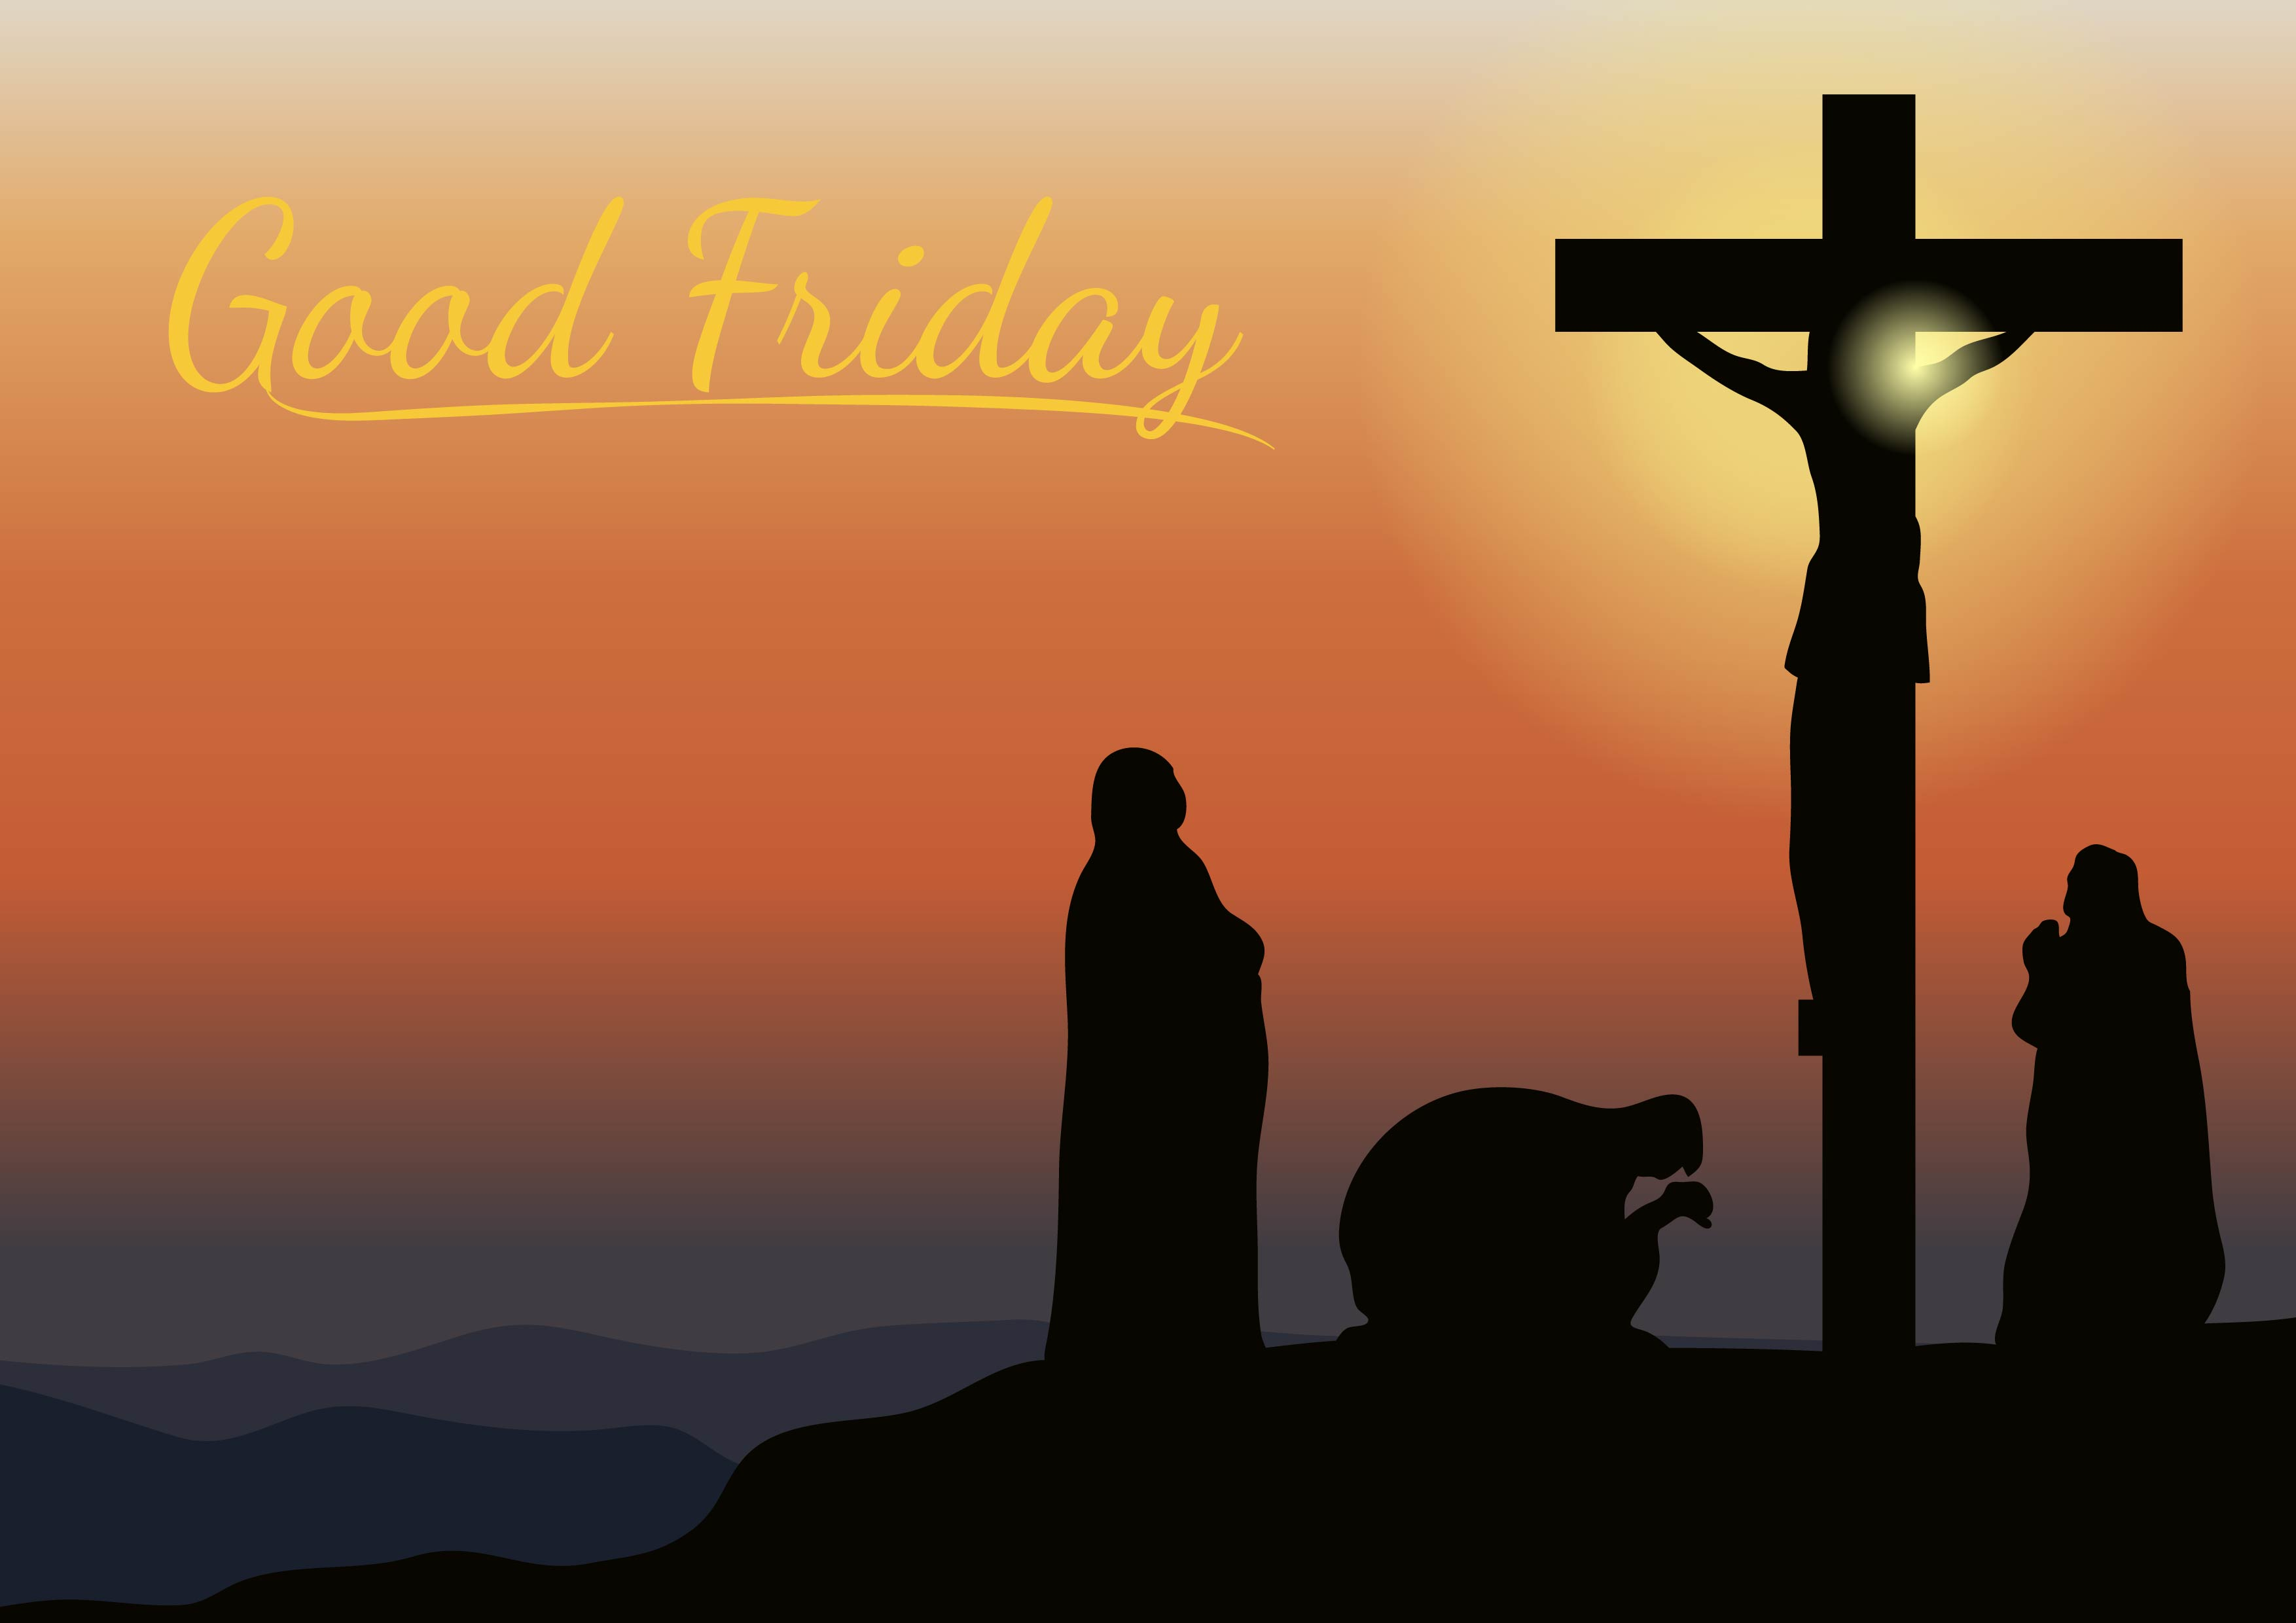 Good Friday Background - Download Free Vector Art, Stock ... | 3508 x 2480 jpeg 139kB